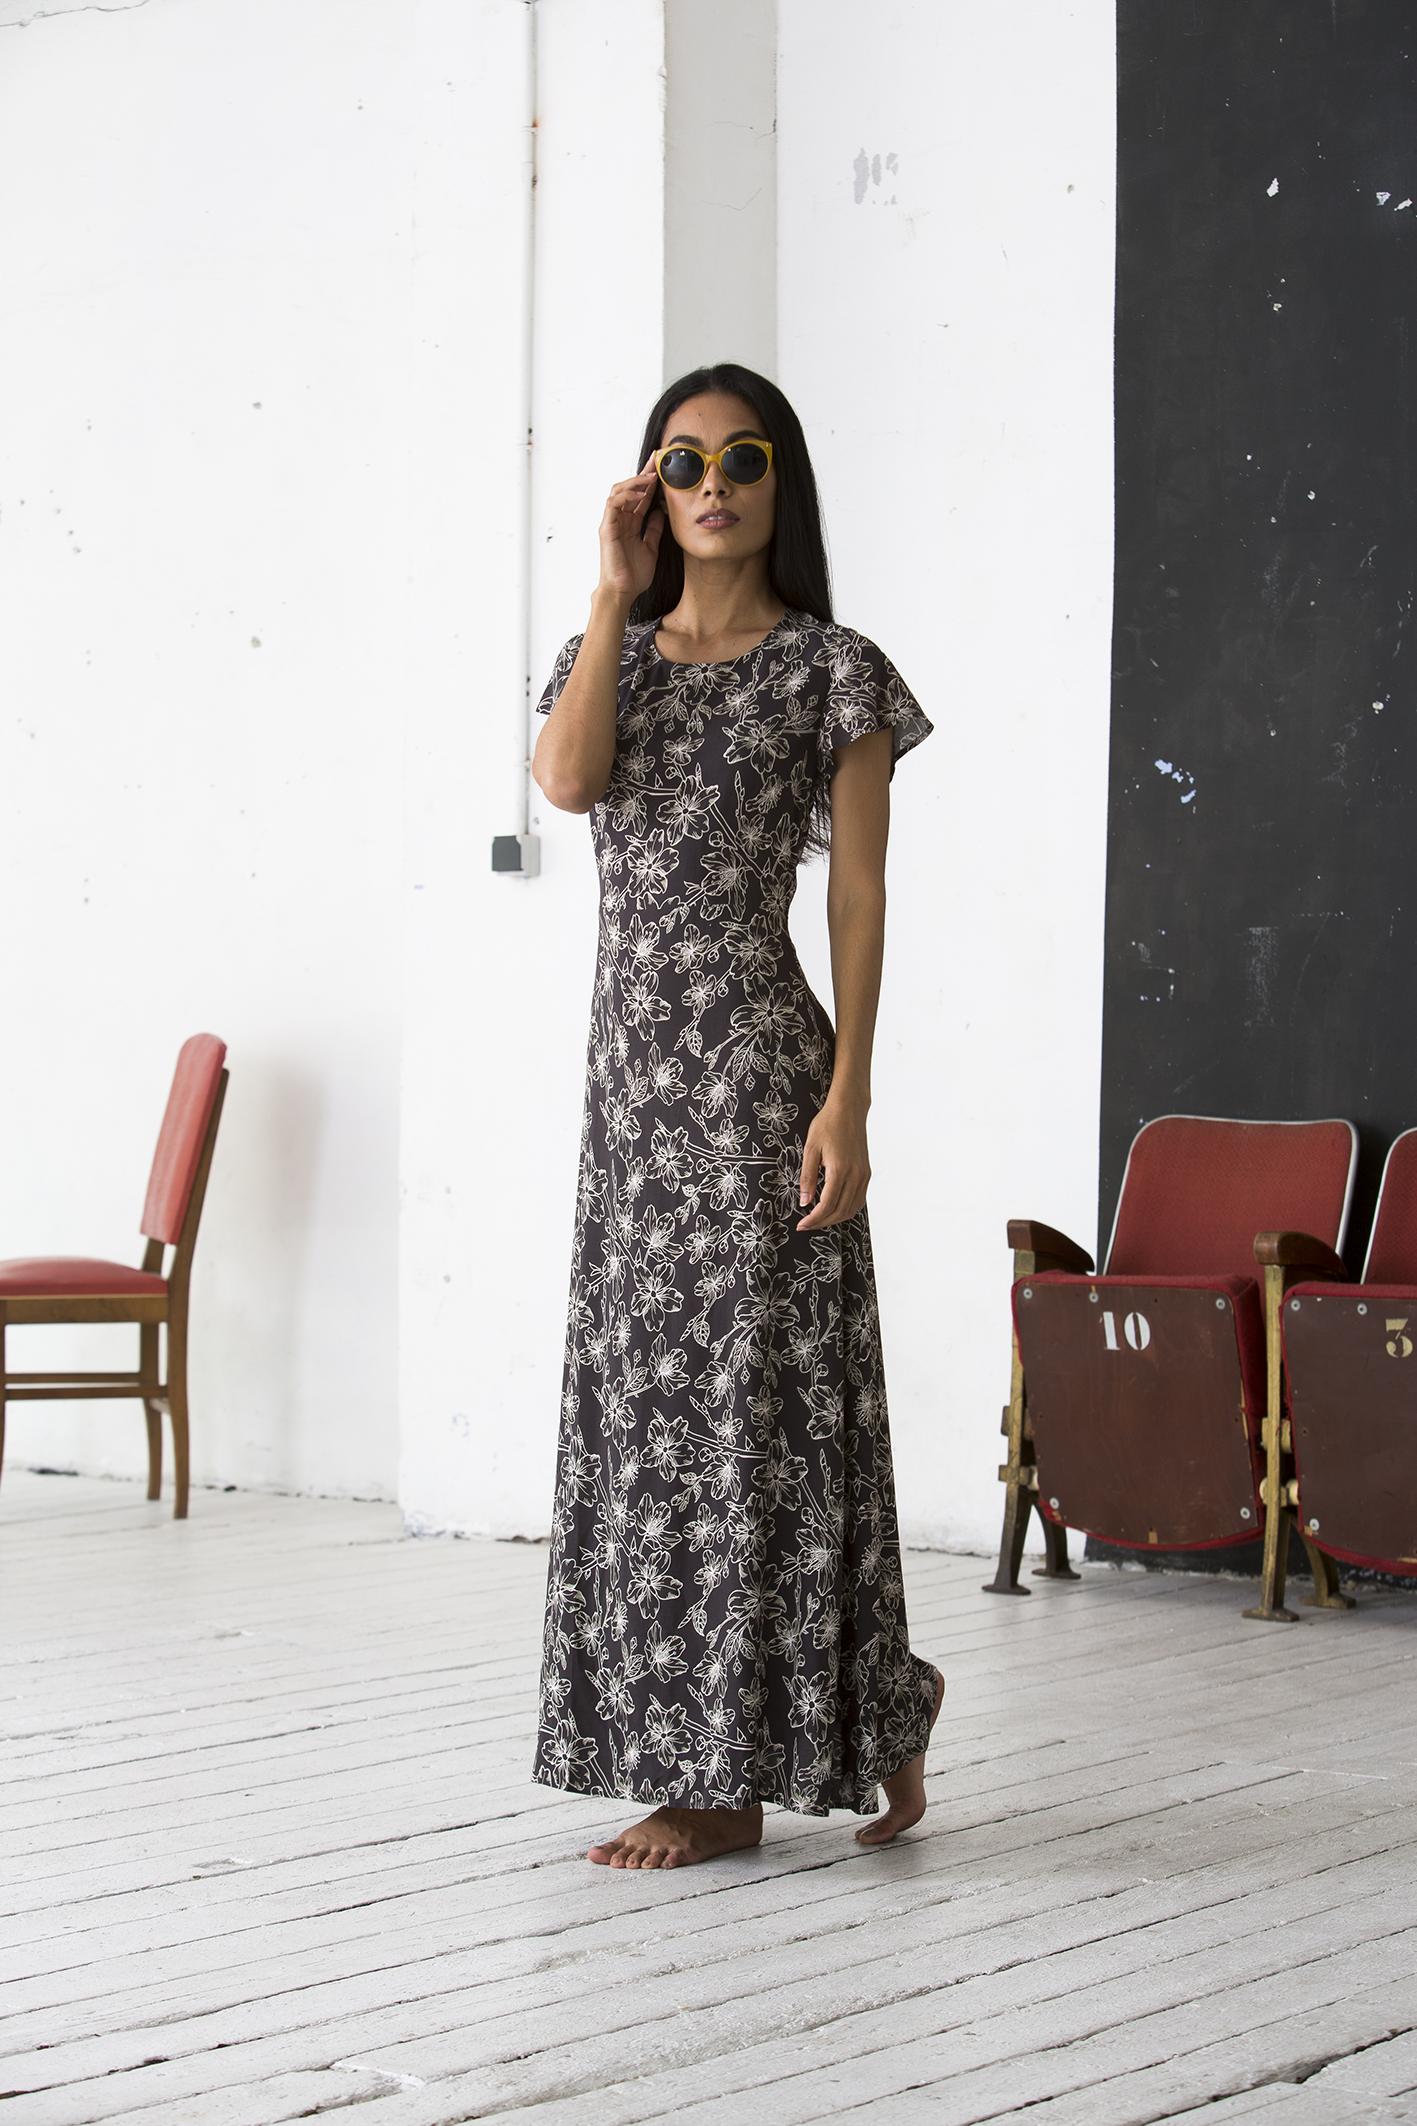 Lola Espeleta Collection Printemps Ete 2018 Theme Slow Future Short Sleeve Dresses Dresses With Sleeves Fashion